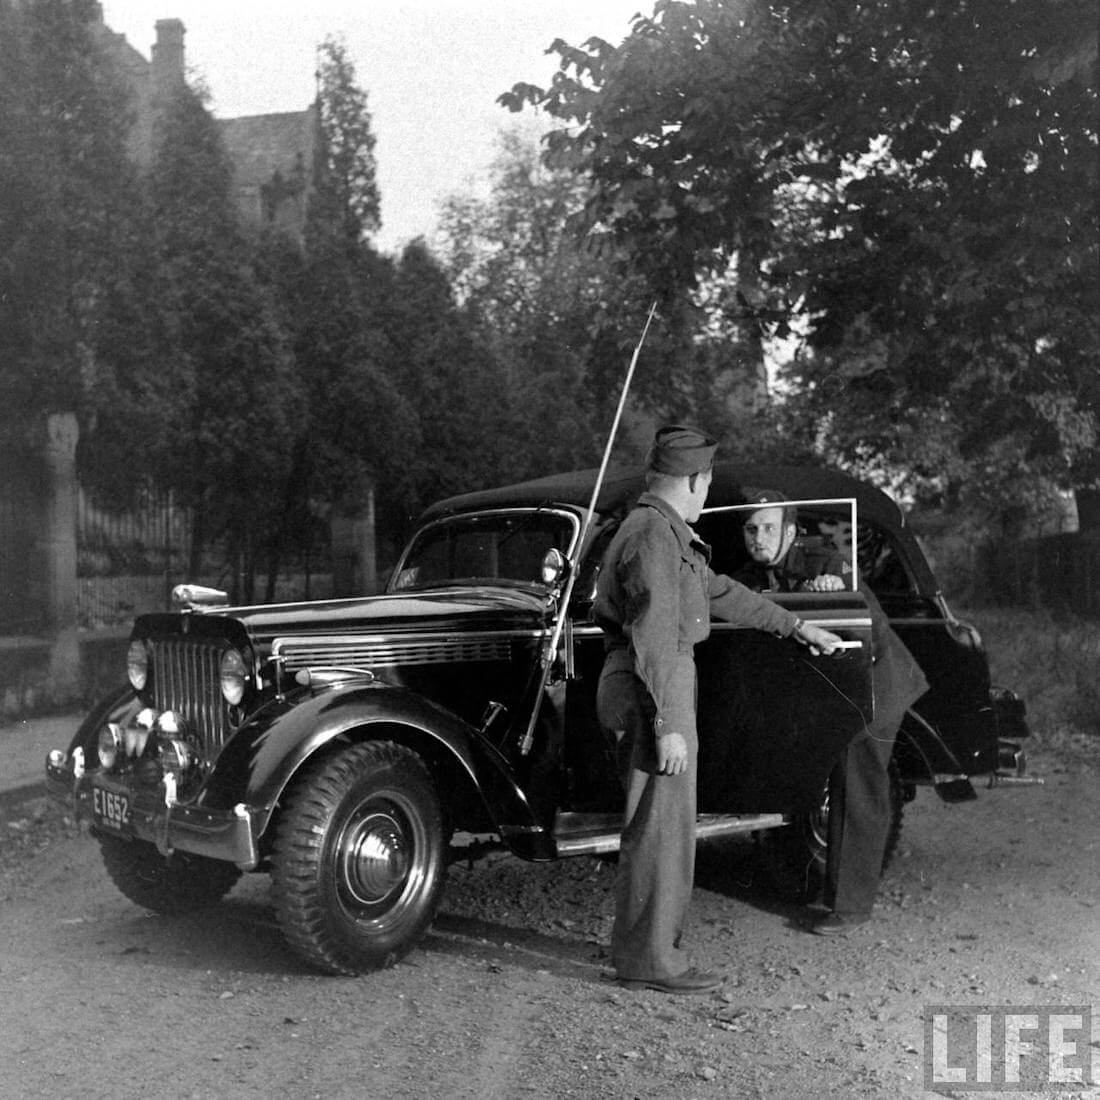 Walter Coch astuu rakentamaansa Willys maastoautoon Saksassa 1946. Kuva: Walter Sanders/Life.